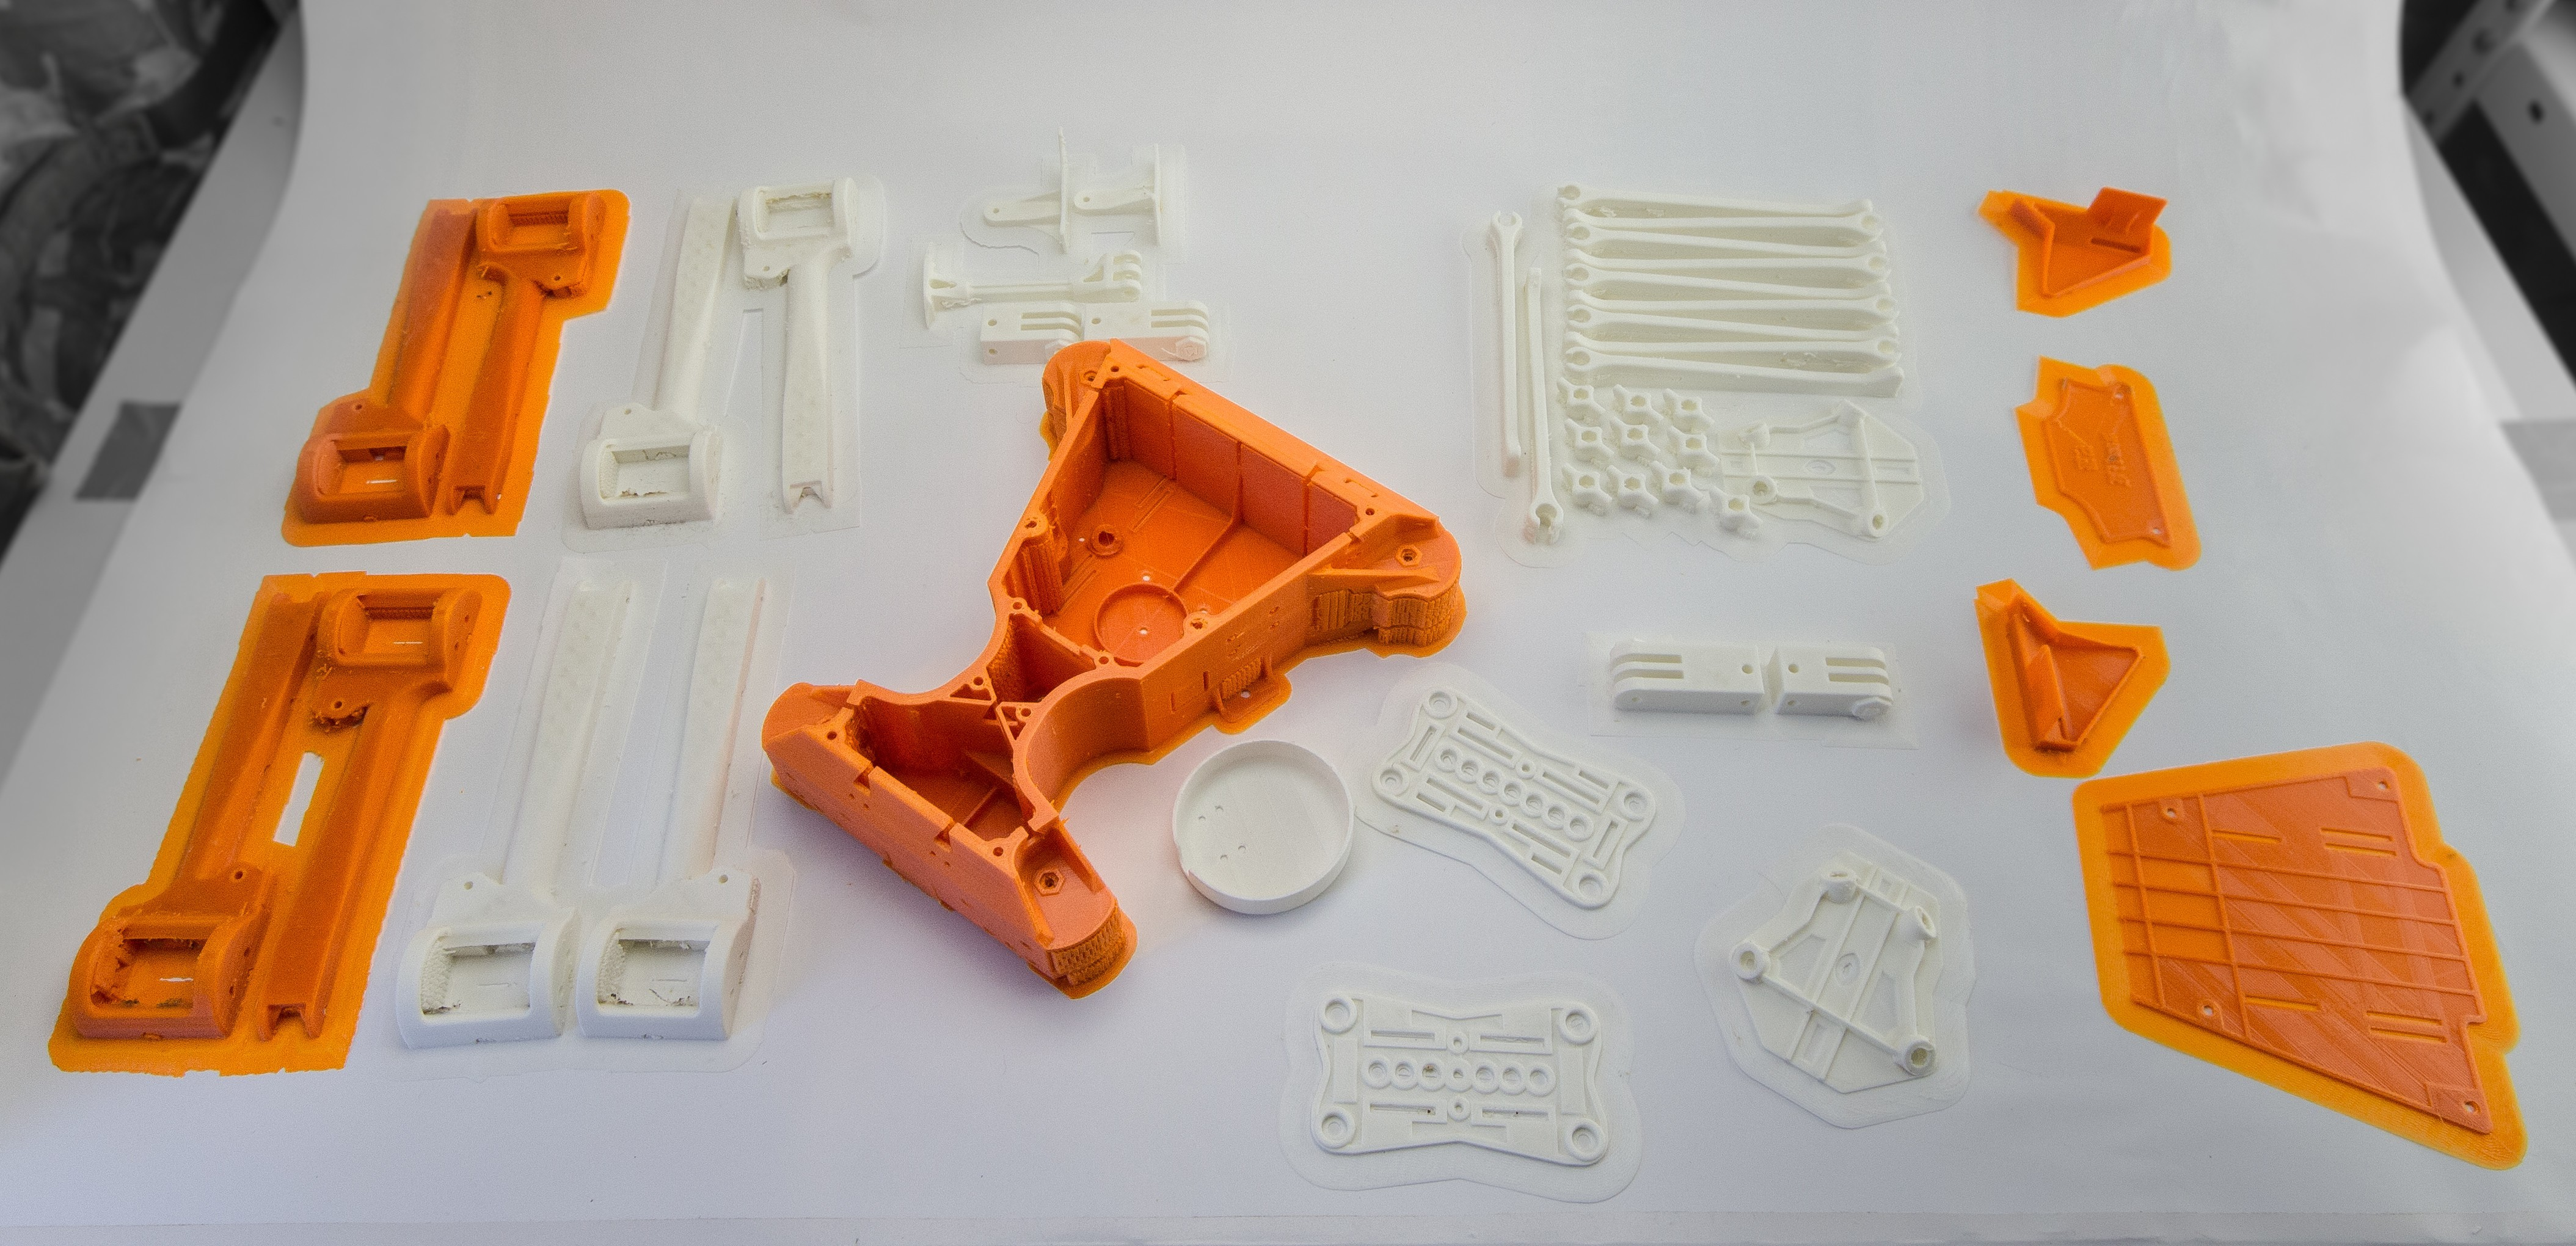 IMG_8394.jpg Download STL file Folding Quadcopter 450 Frame • 3D print object, AleksandrDolzhenko